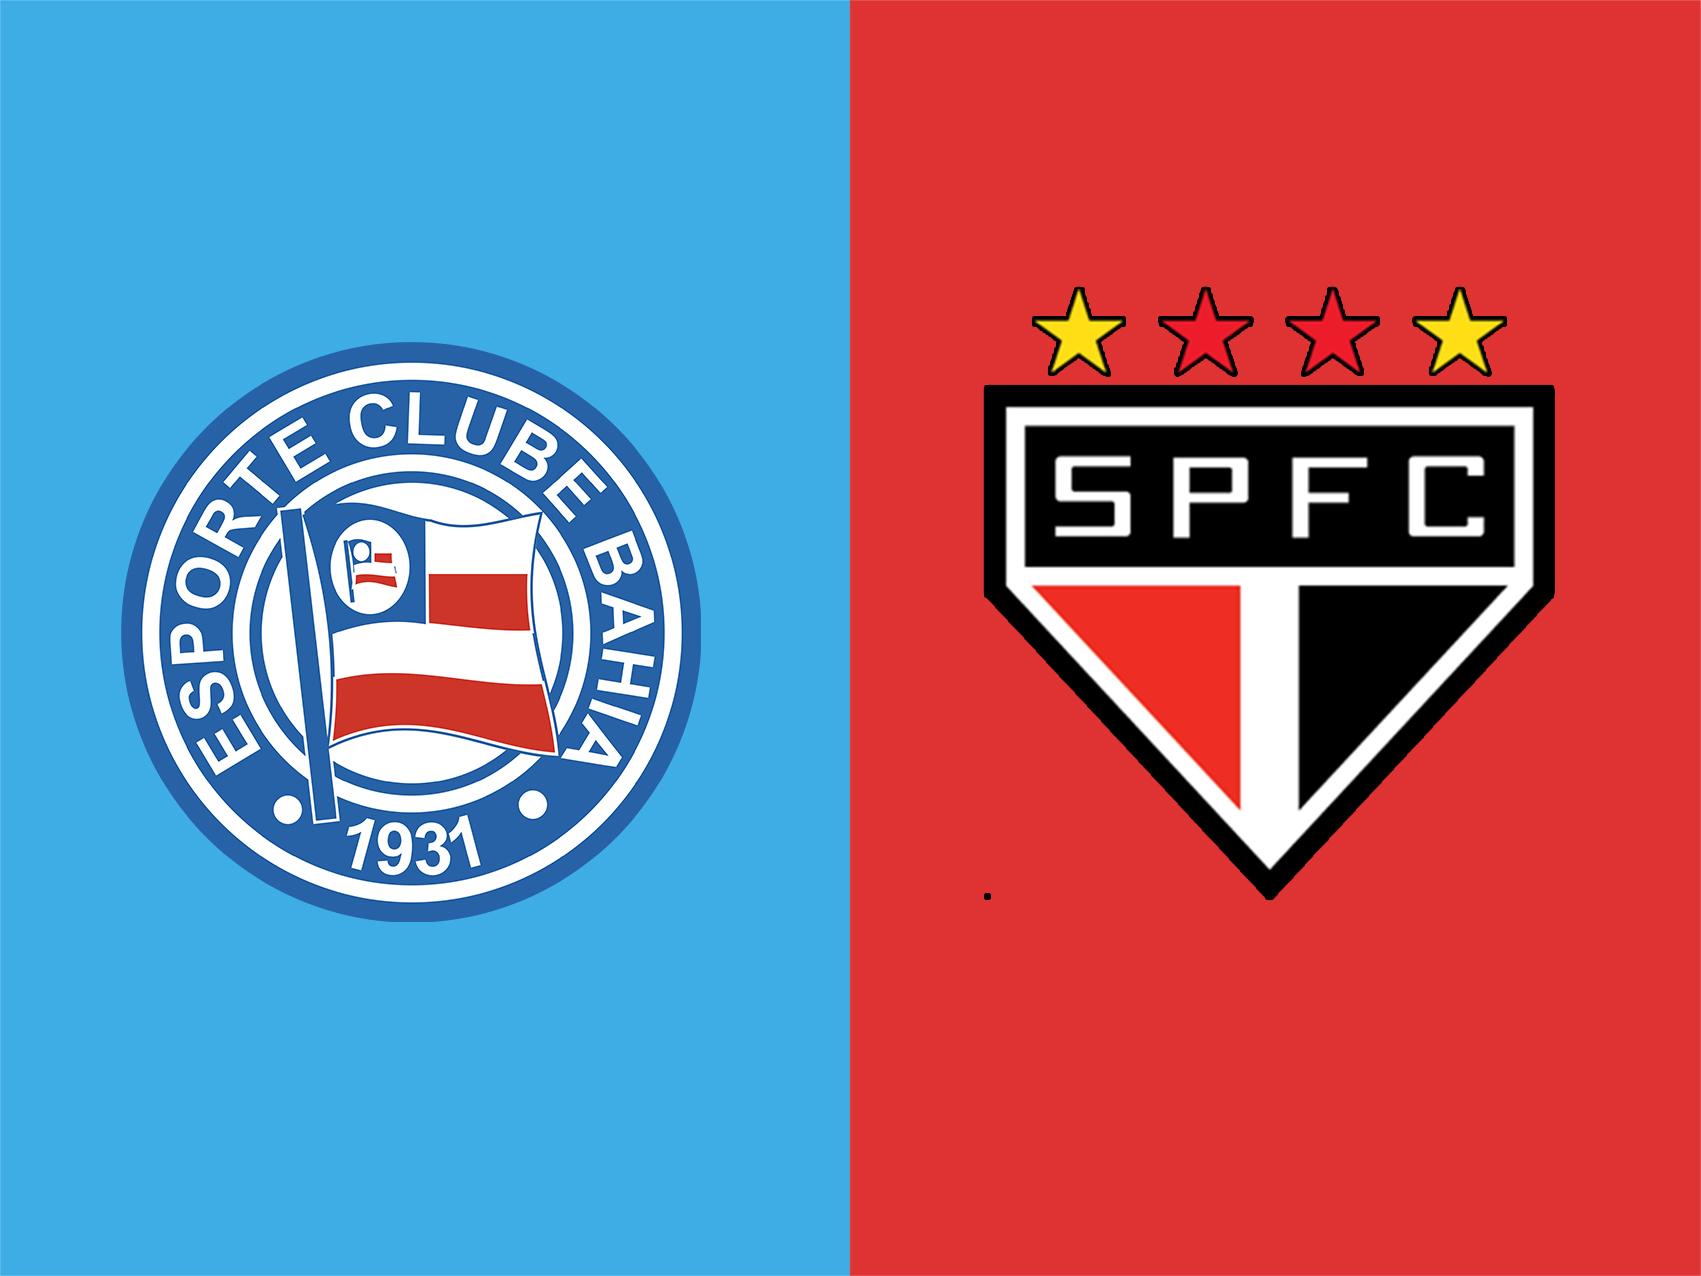 bahia-vs-sao-paulo-soi-keo-vdqg-brazil-10-10-trai-tim-ri-mau-0